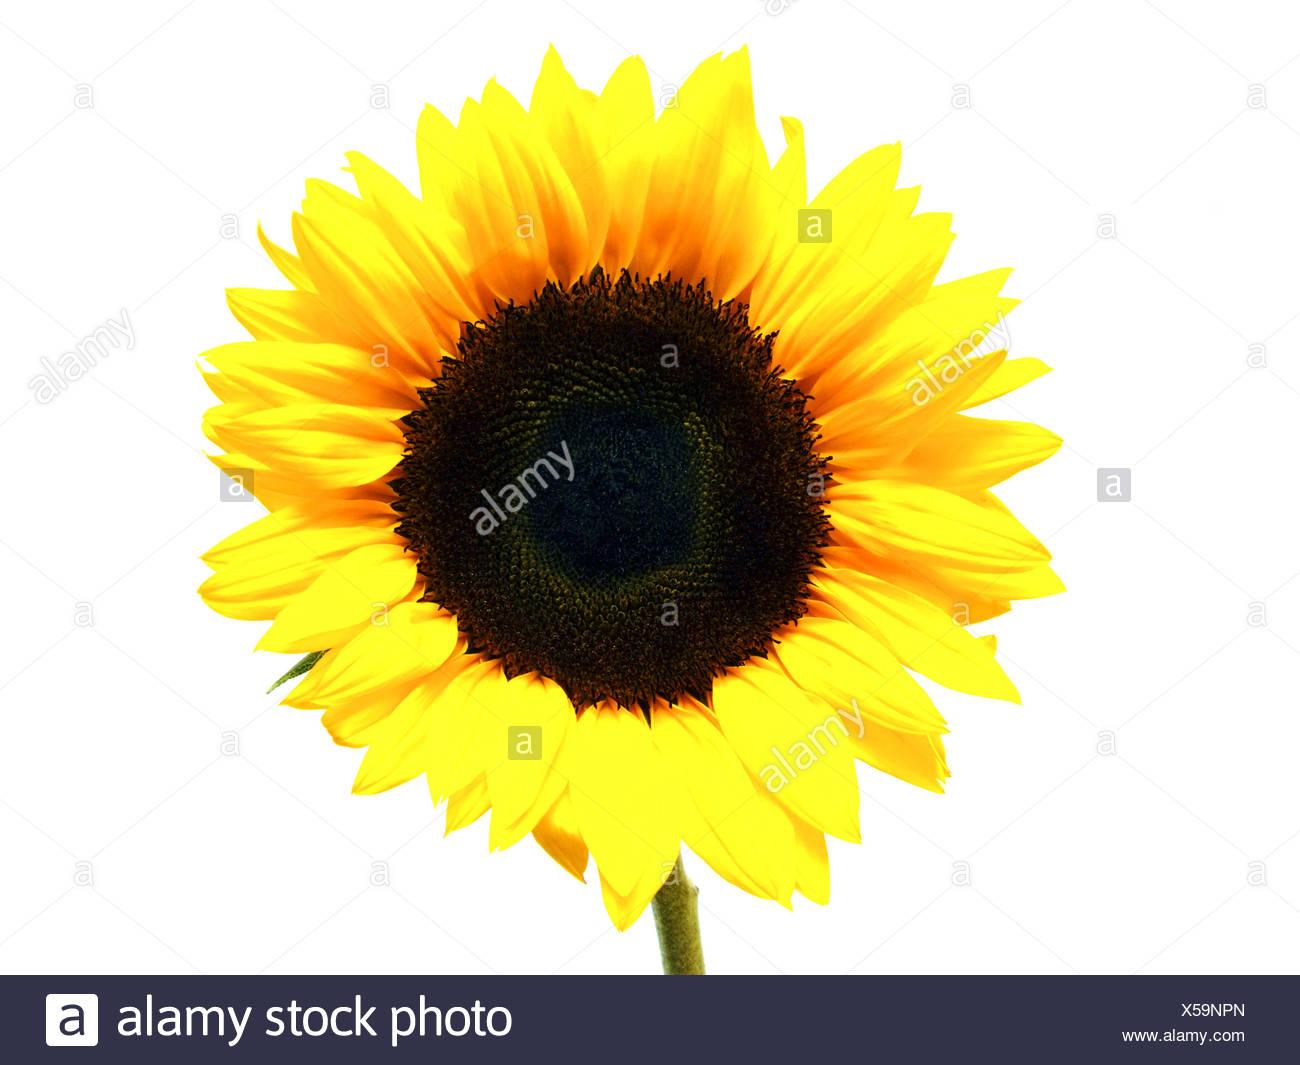 Sonnenblume / sunflower (Helianthus annuus) - Stock Image